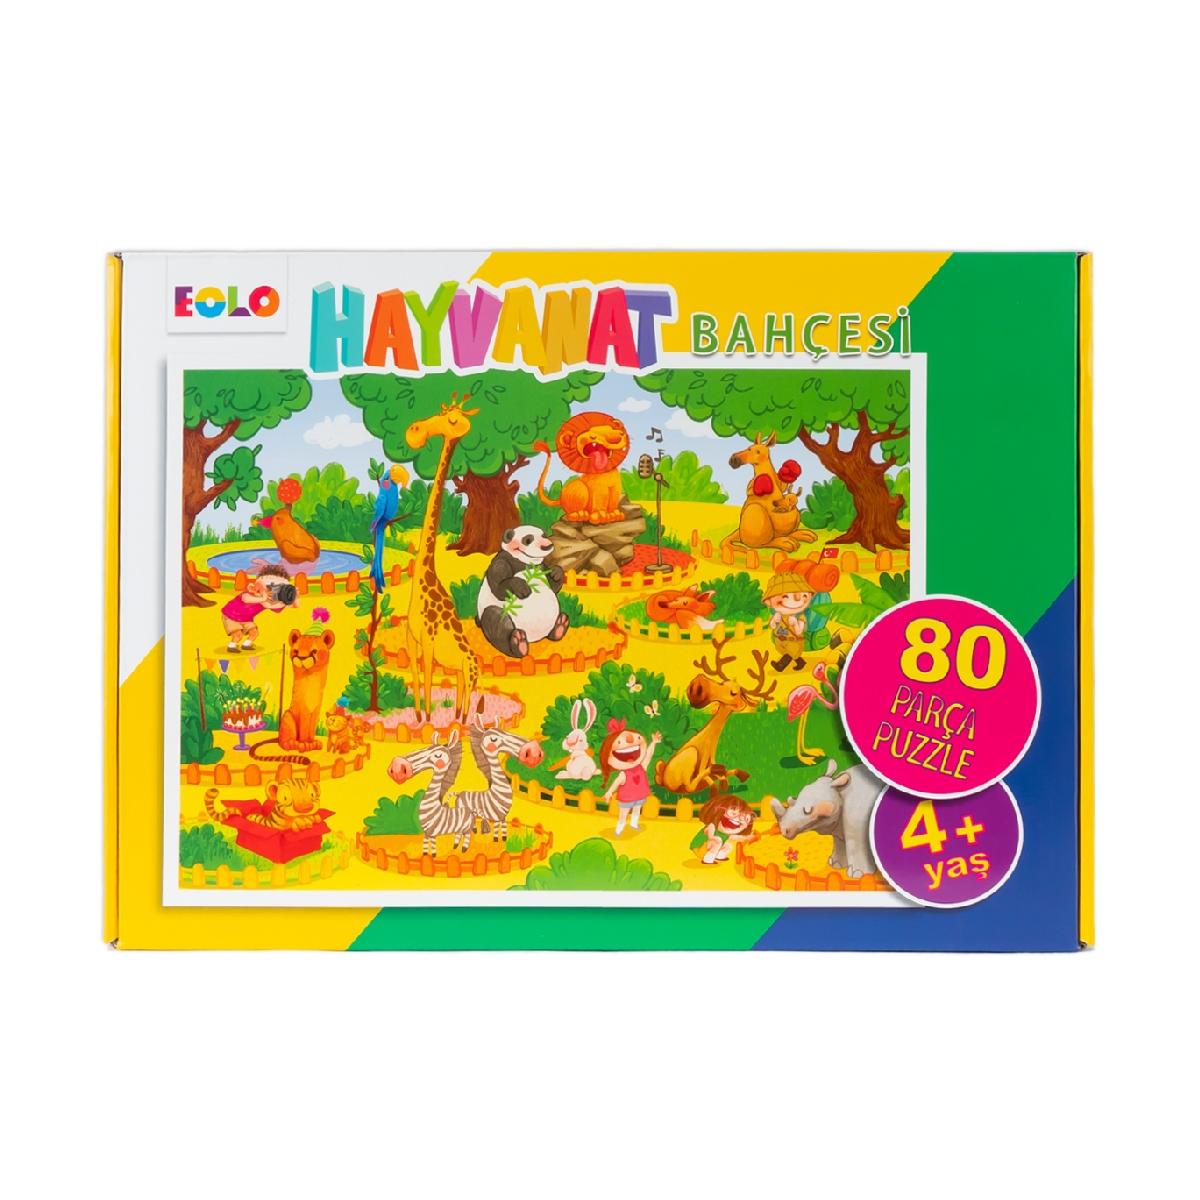 80 Parça Yer Puzzle – Hayvanat Bahçesi